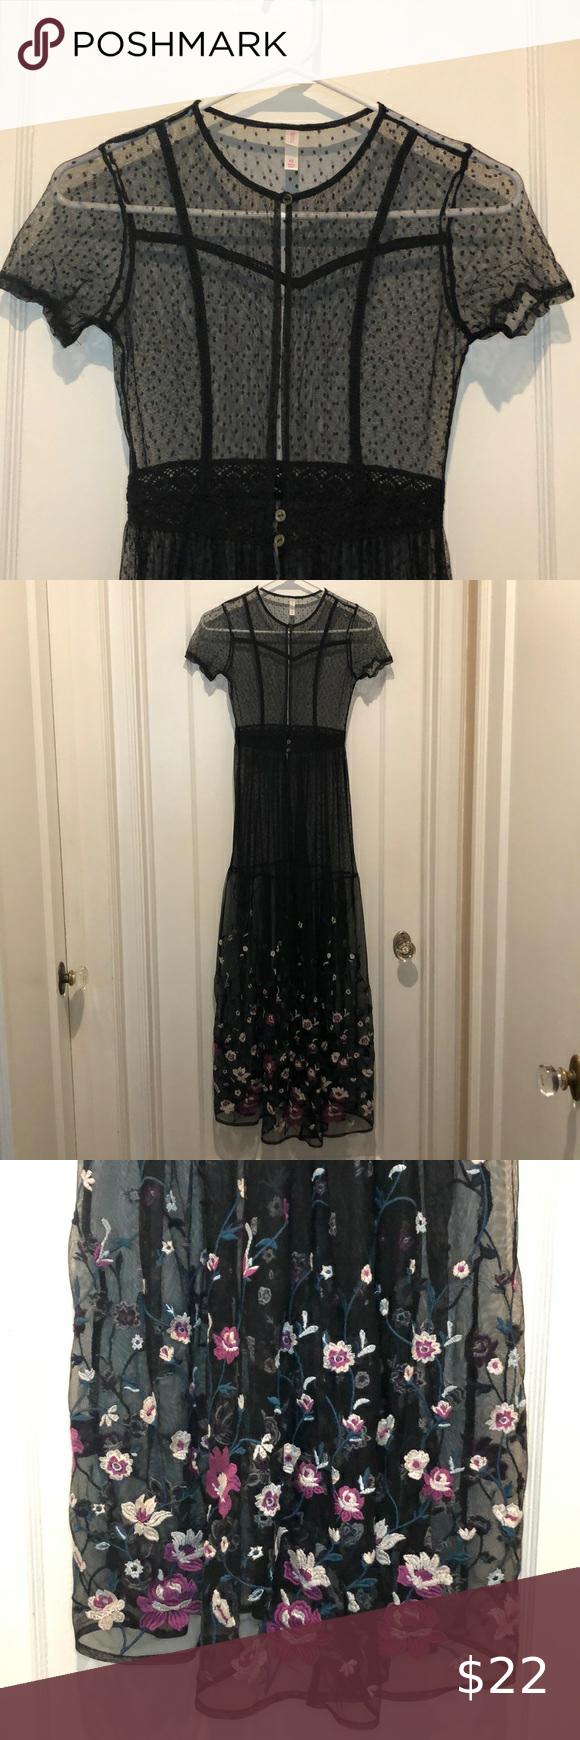 Size Extra Small Sheer Overlay Dress Sheer Overlay Dress Overlay Dress Clothes Design [ 1740 x 580 Pixel ]